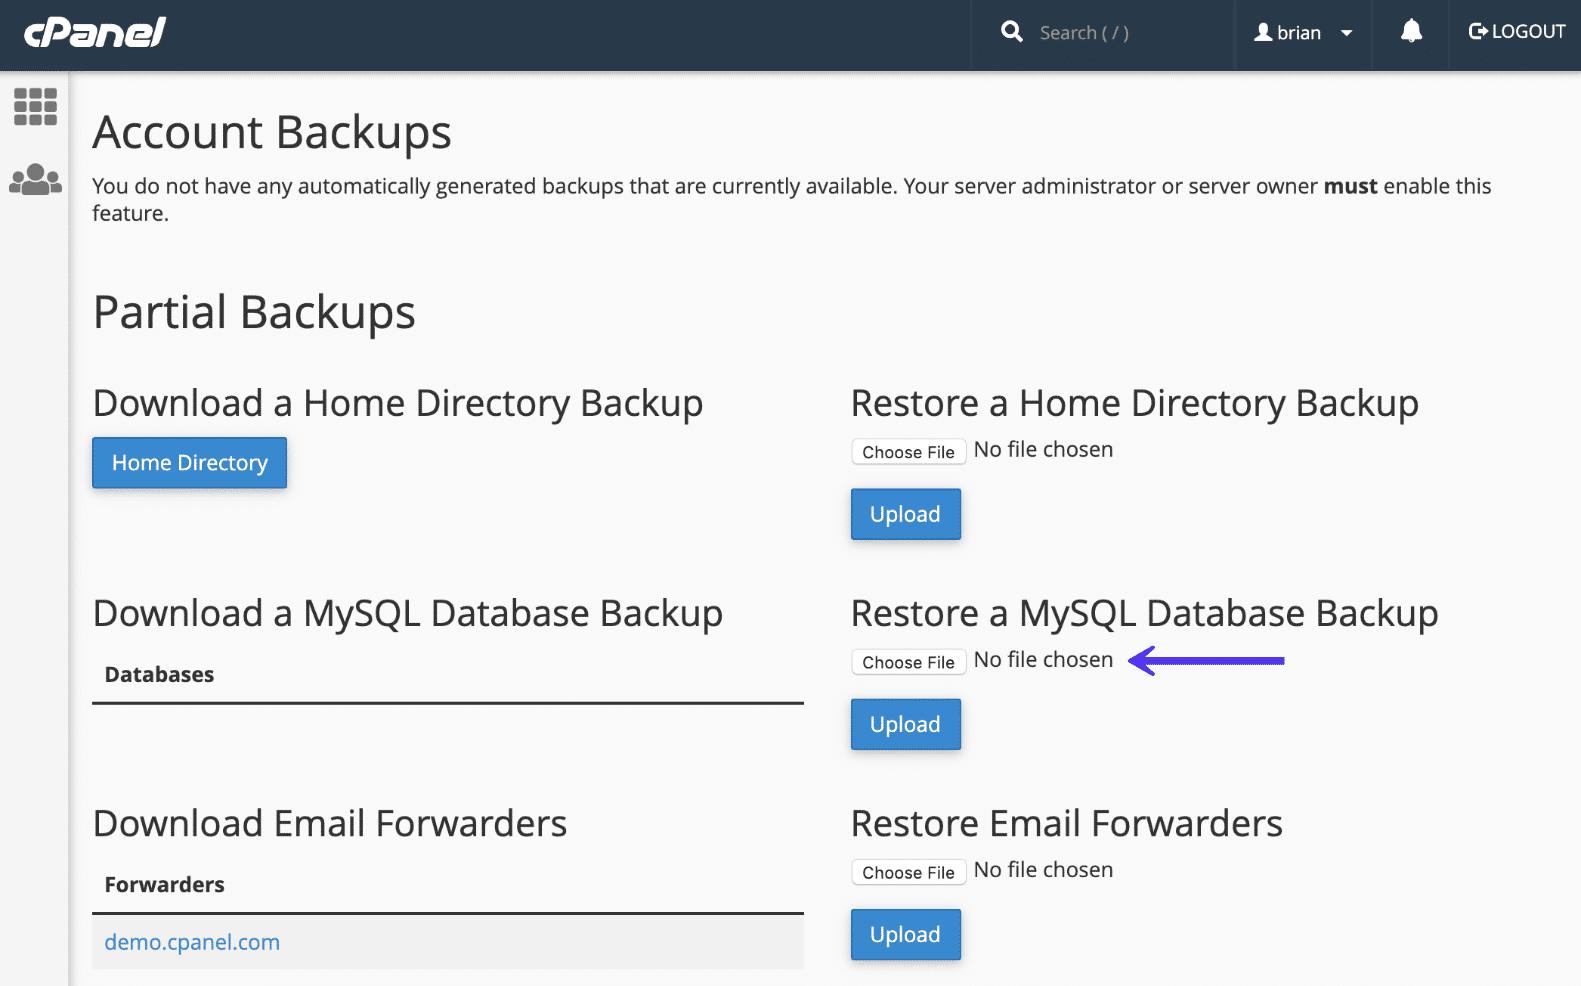 Restaurar backup de banco de dados MySQL no cPanel